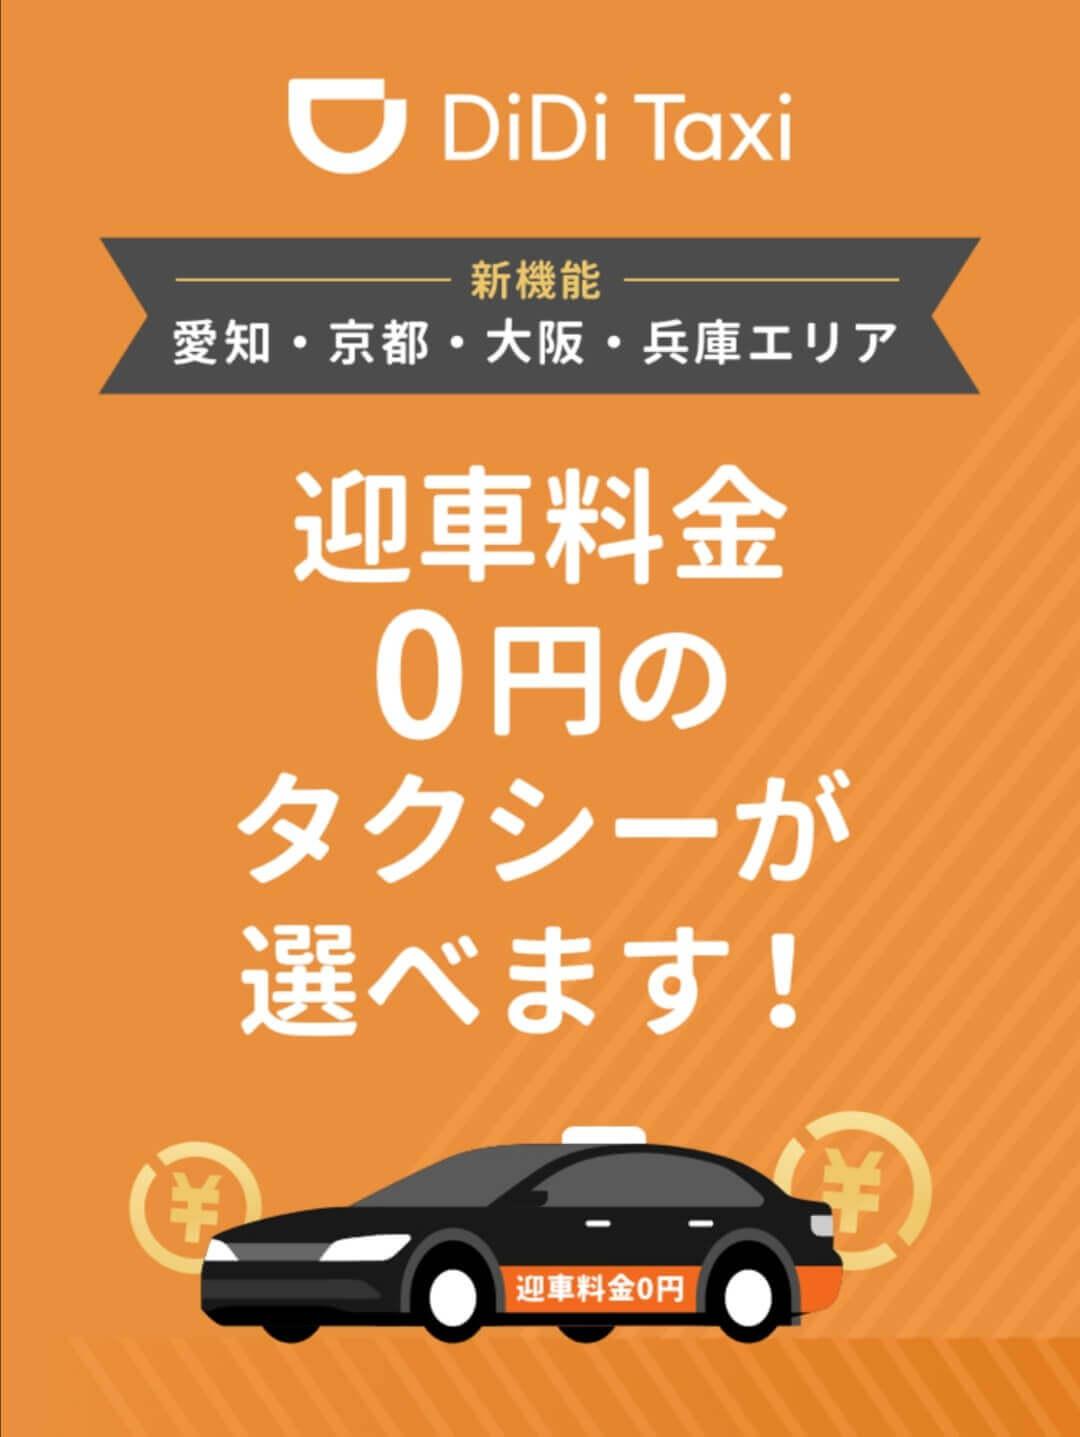 didi(ディディ)タクシー迎車料金無料